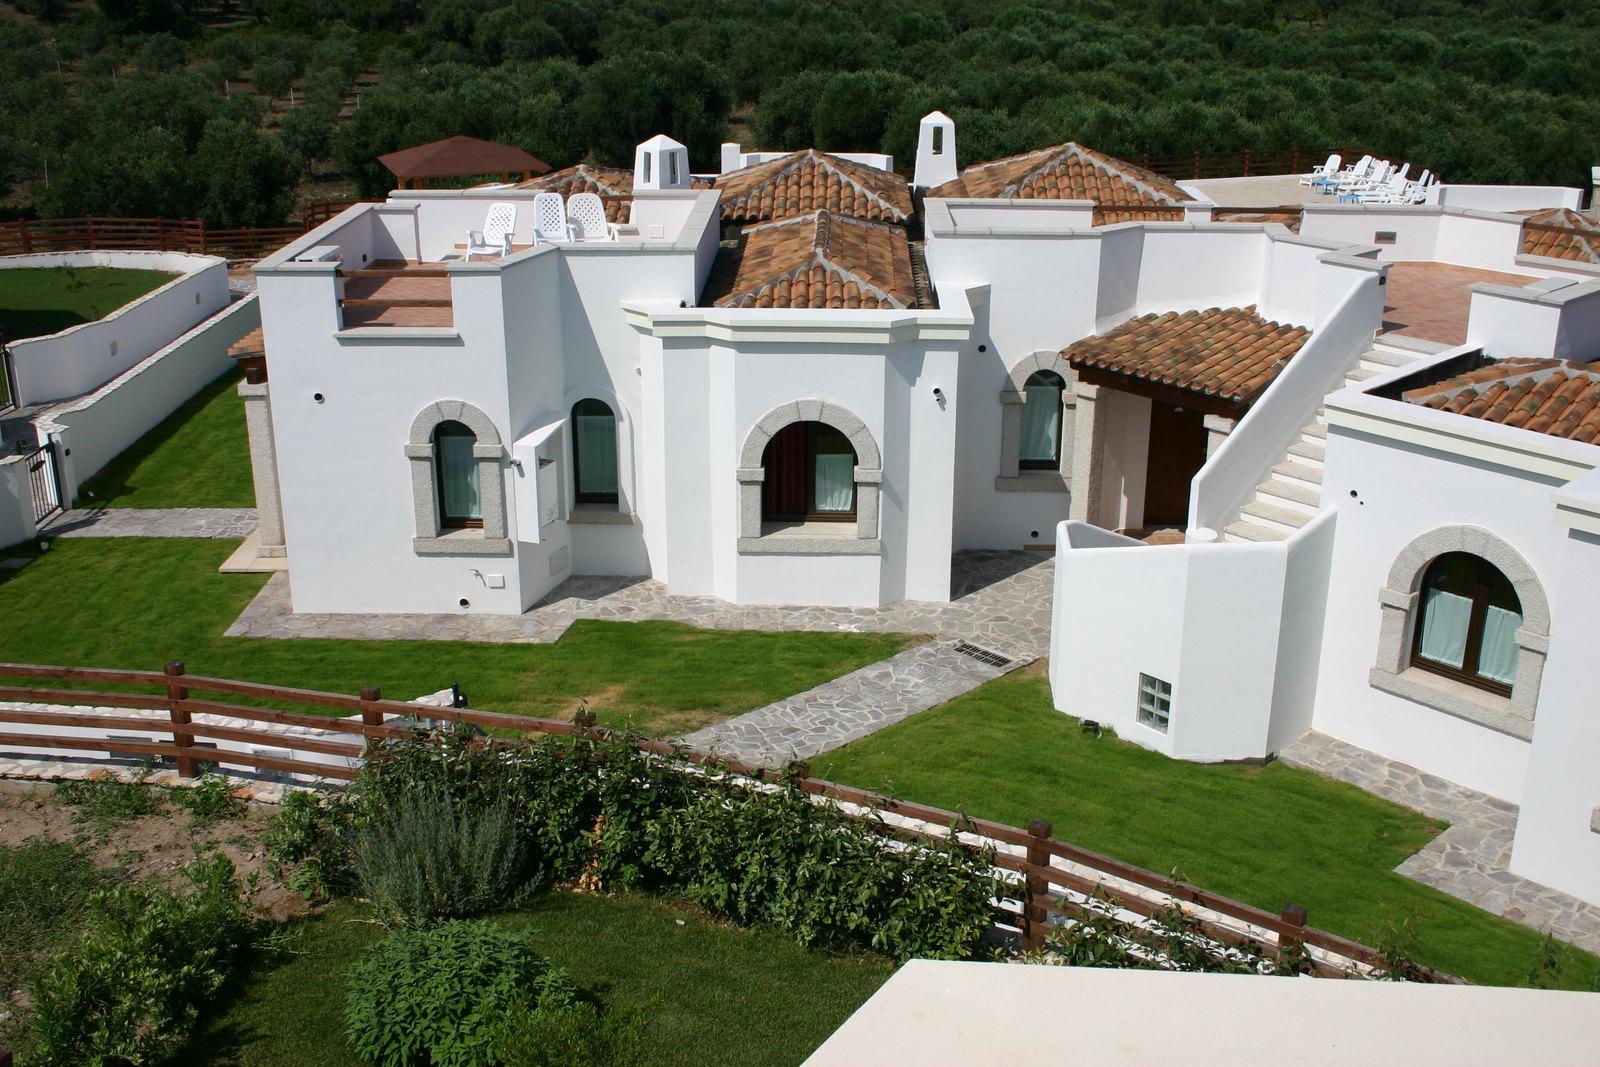 Ferienhaus Carru (877335), Sant Angelo Custode, Sassari, Sardinien, Italien, Bild 16